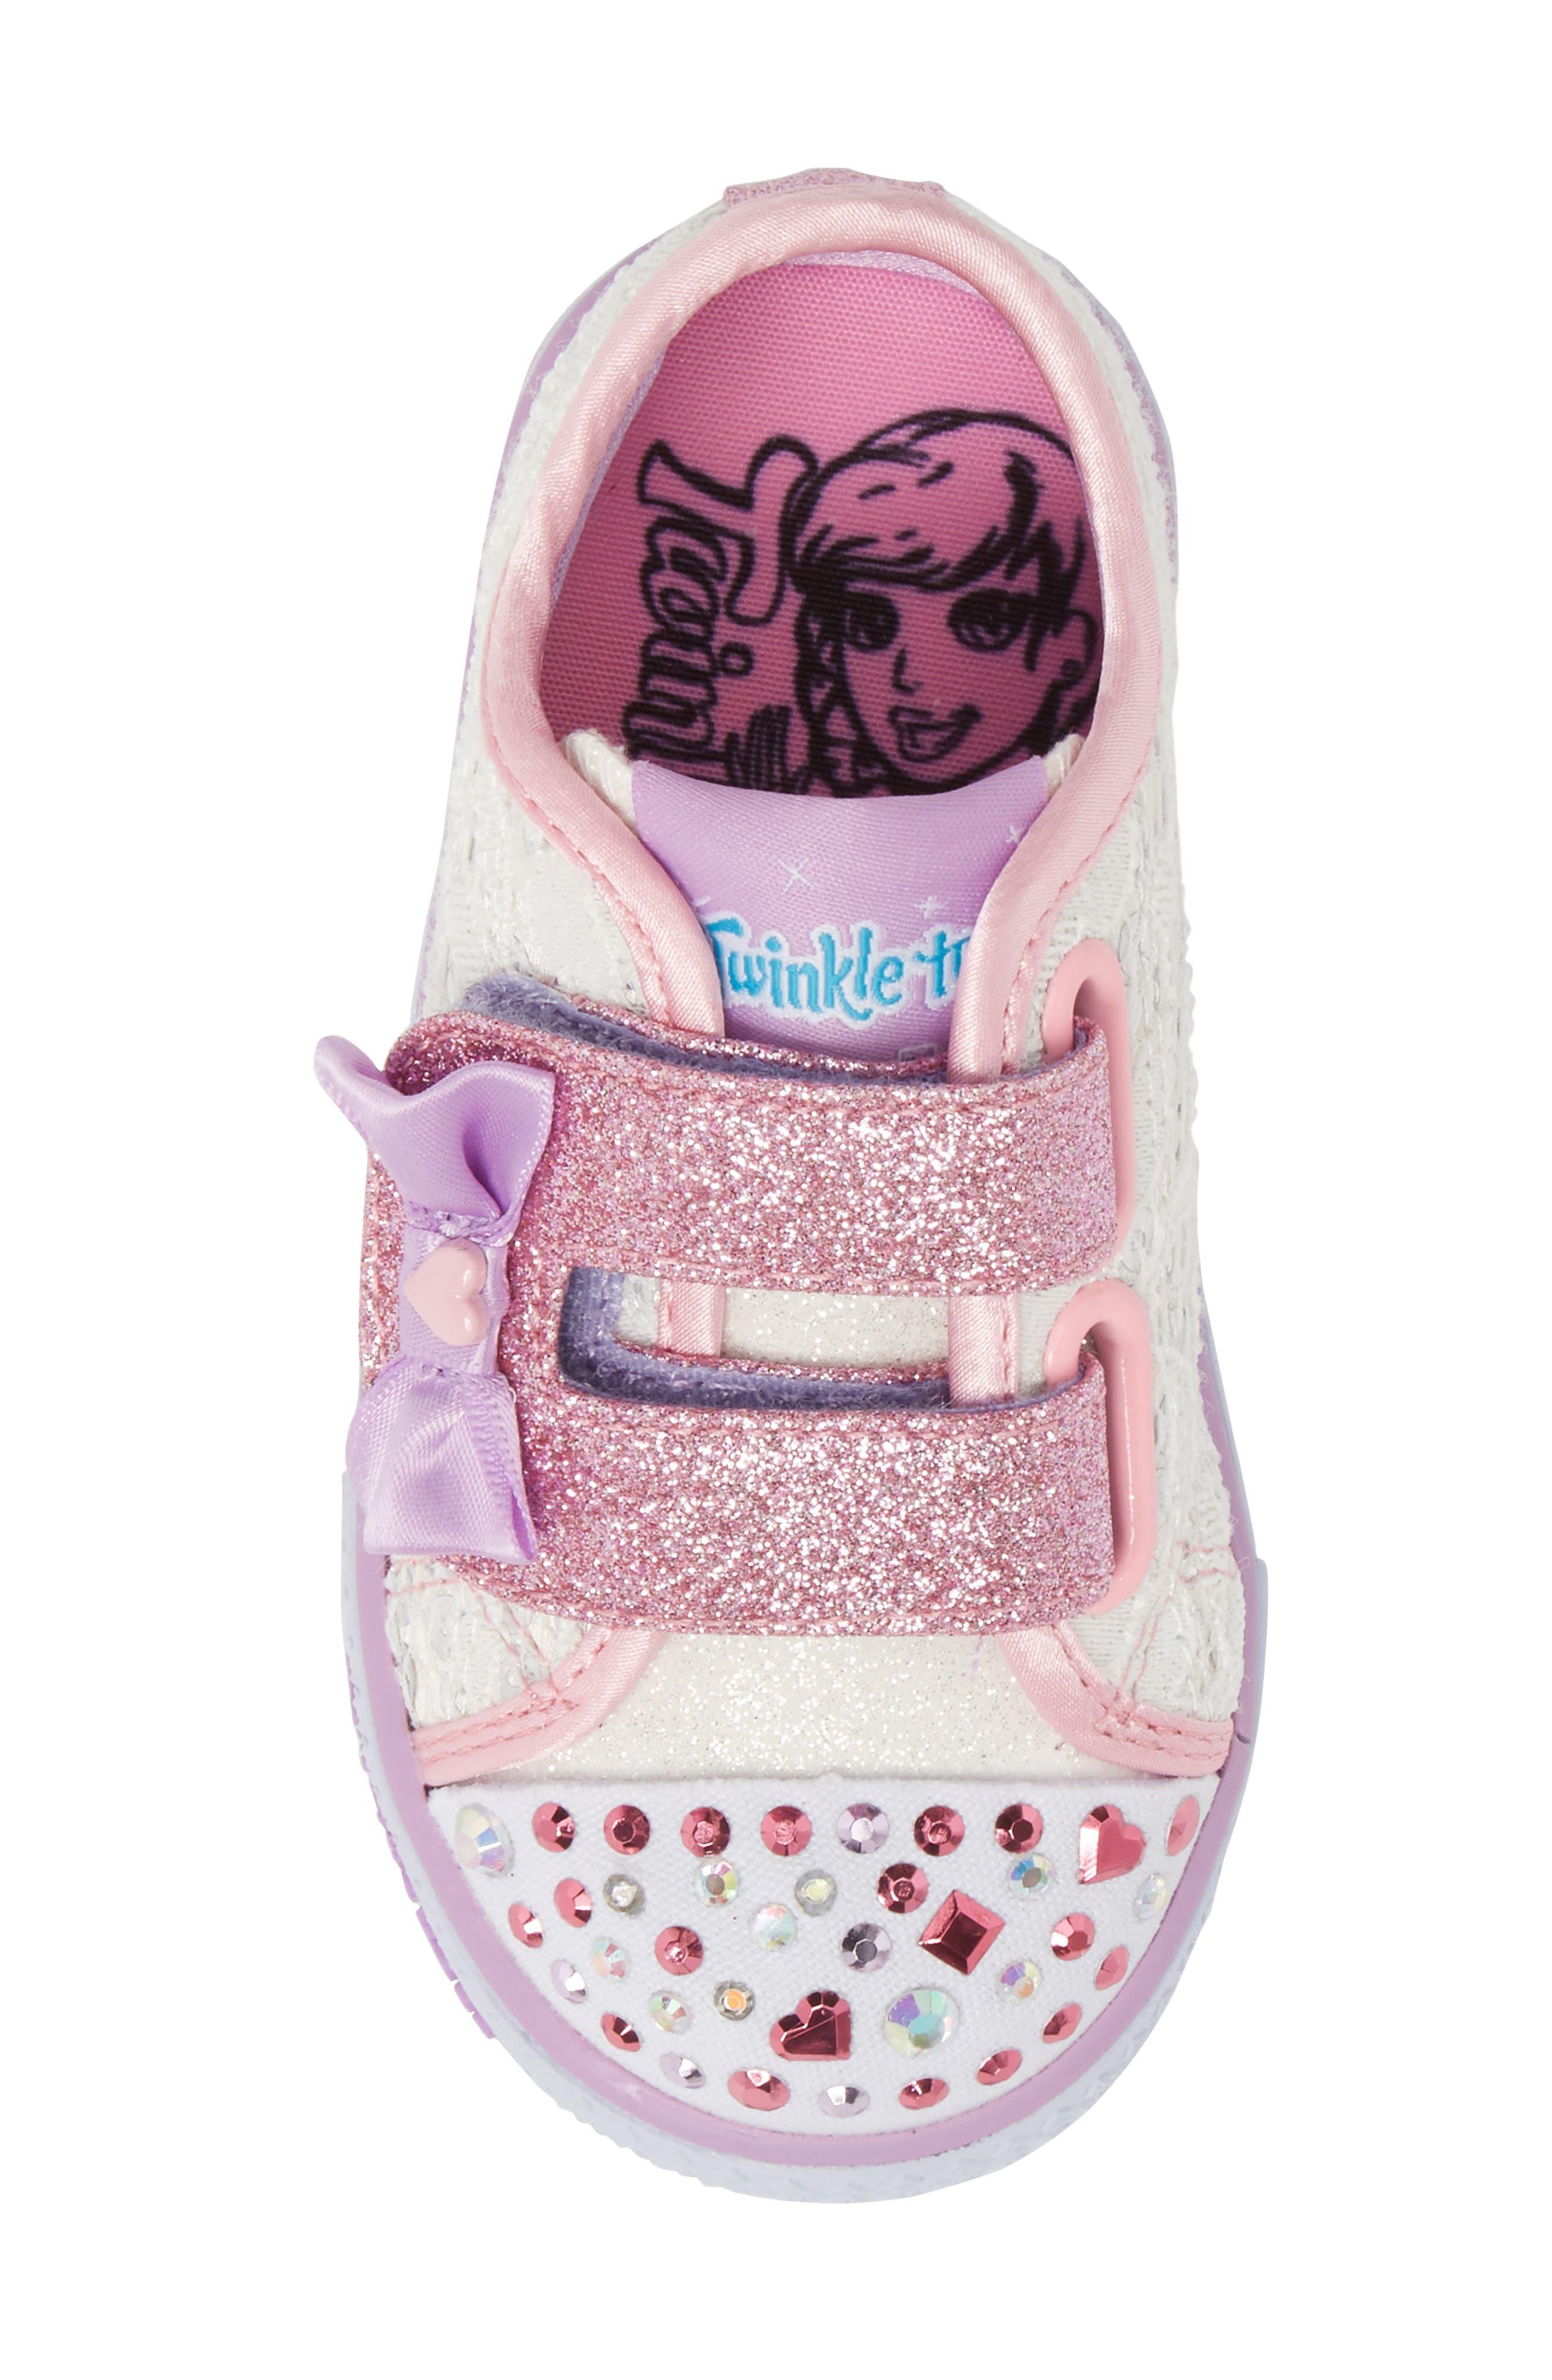 Twinkle Toes Shuffles Light-Up Glitter Sneaker,                             Alternate thumbnail 5, color,                             White/ Silver/ Light Pink